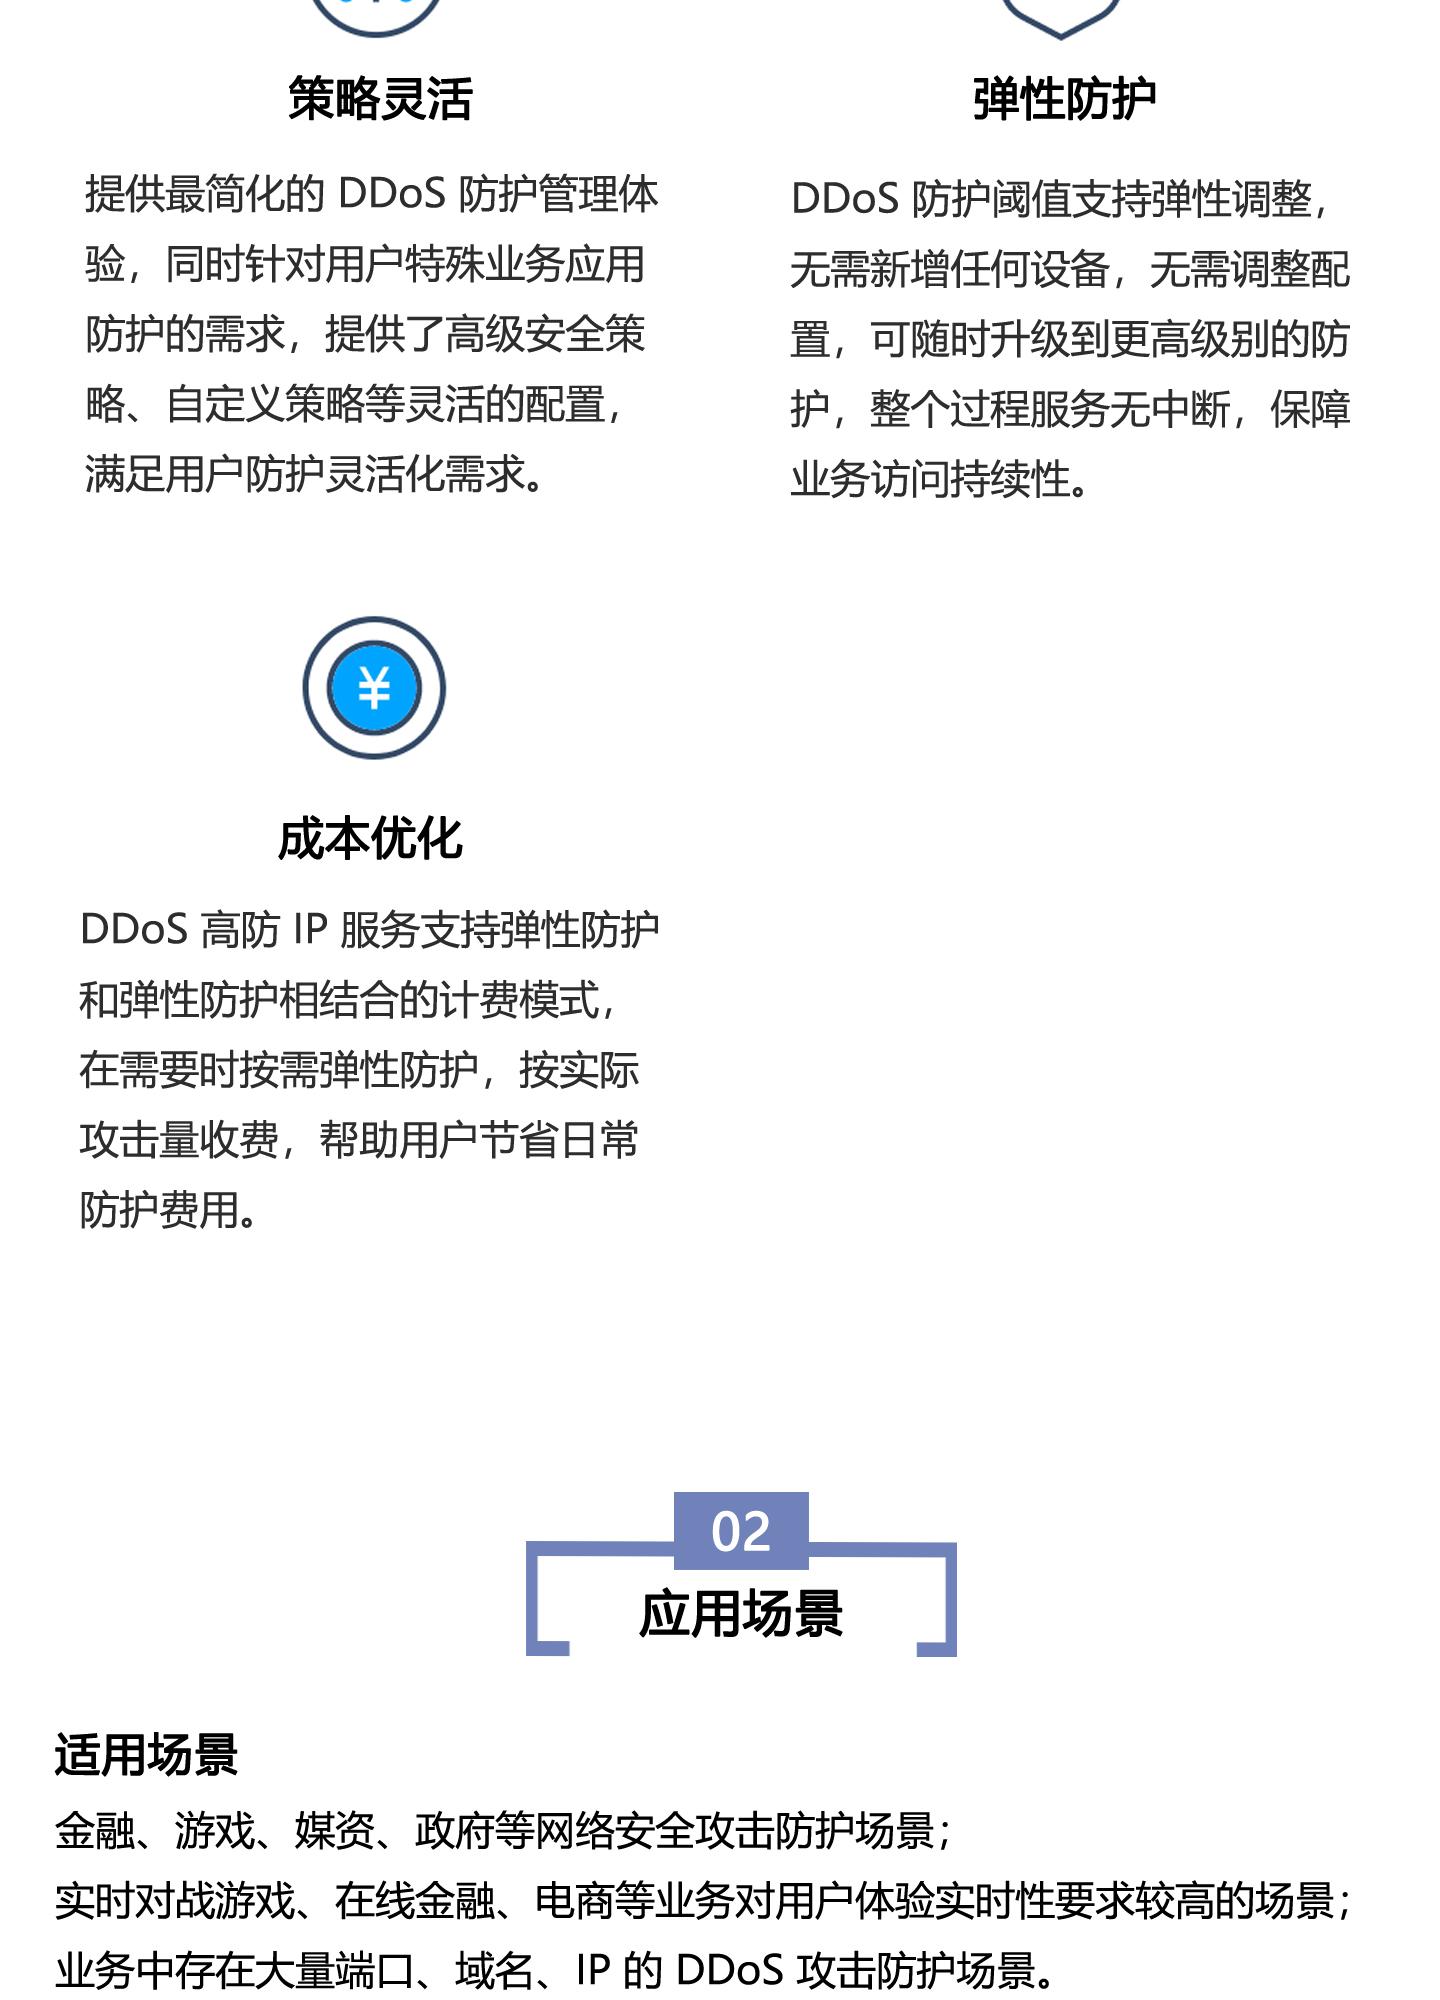 T-Sec-DDoS-高防-IP1440_03.jpg